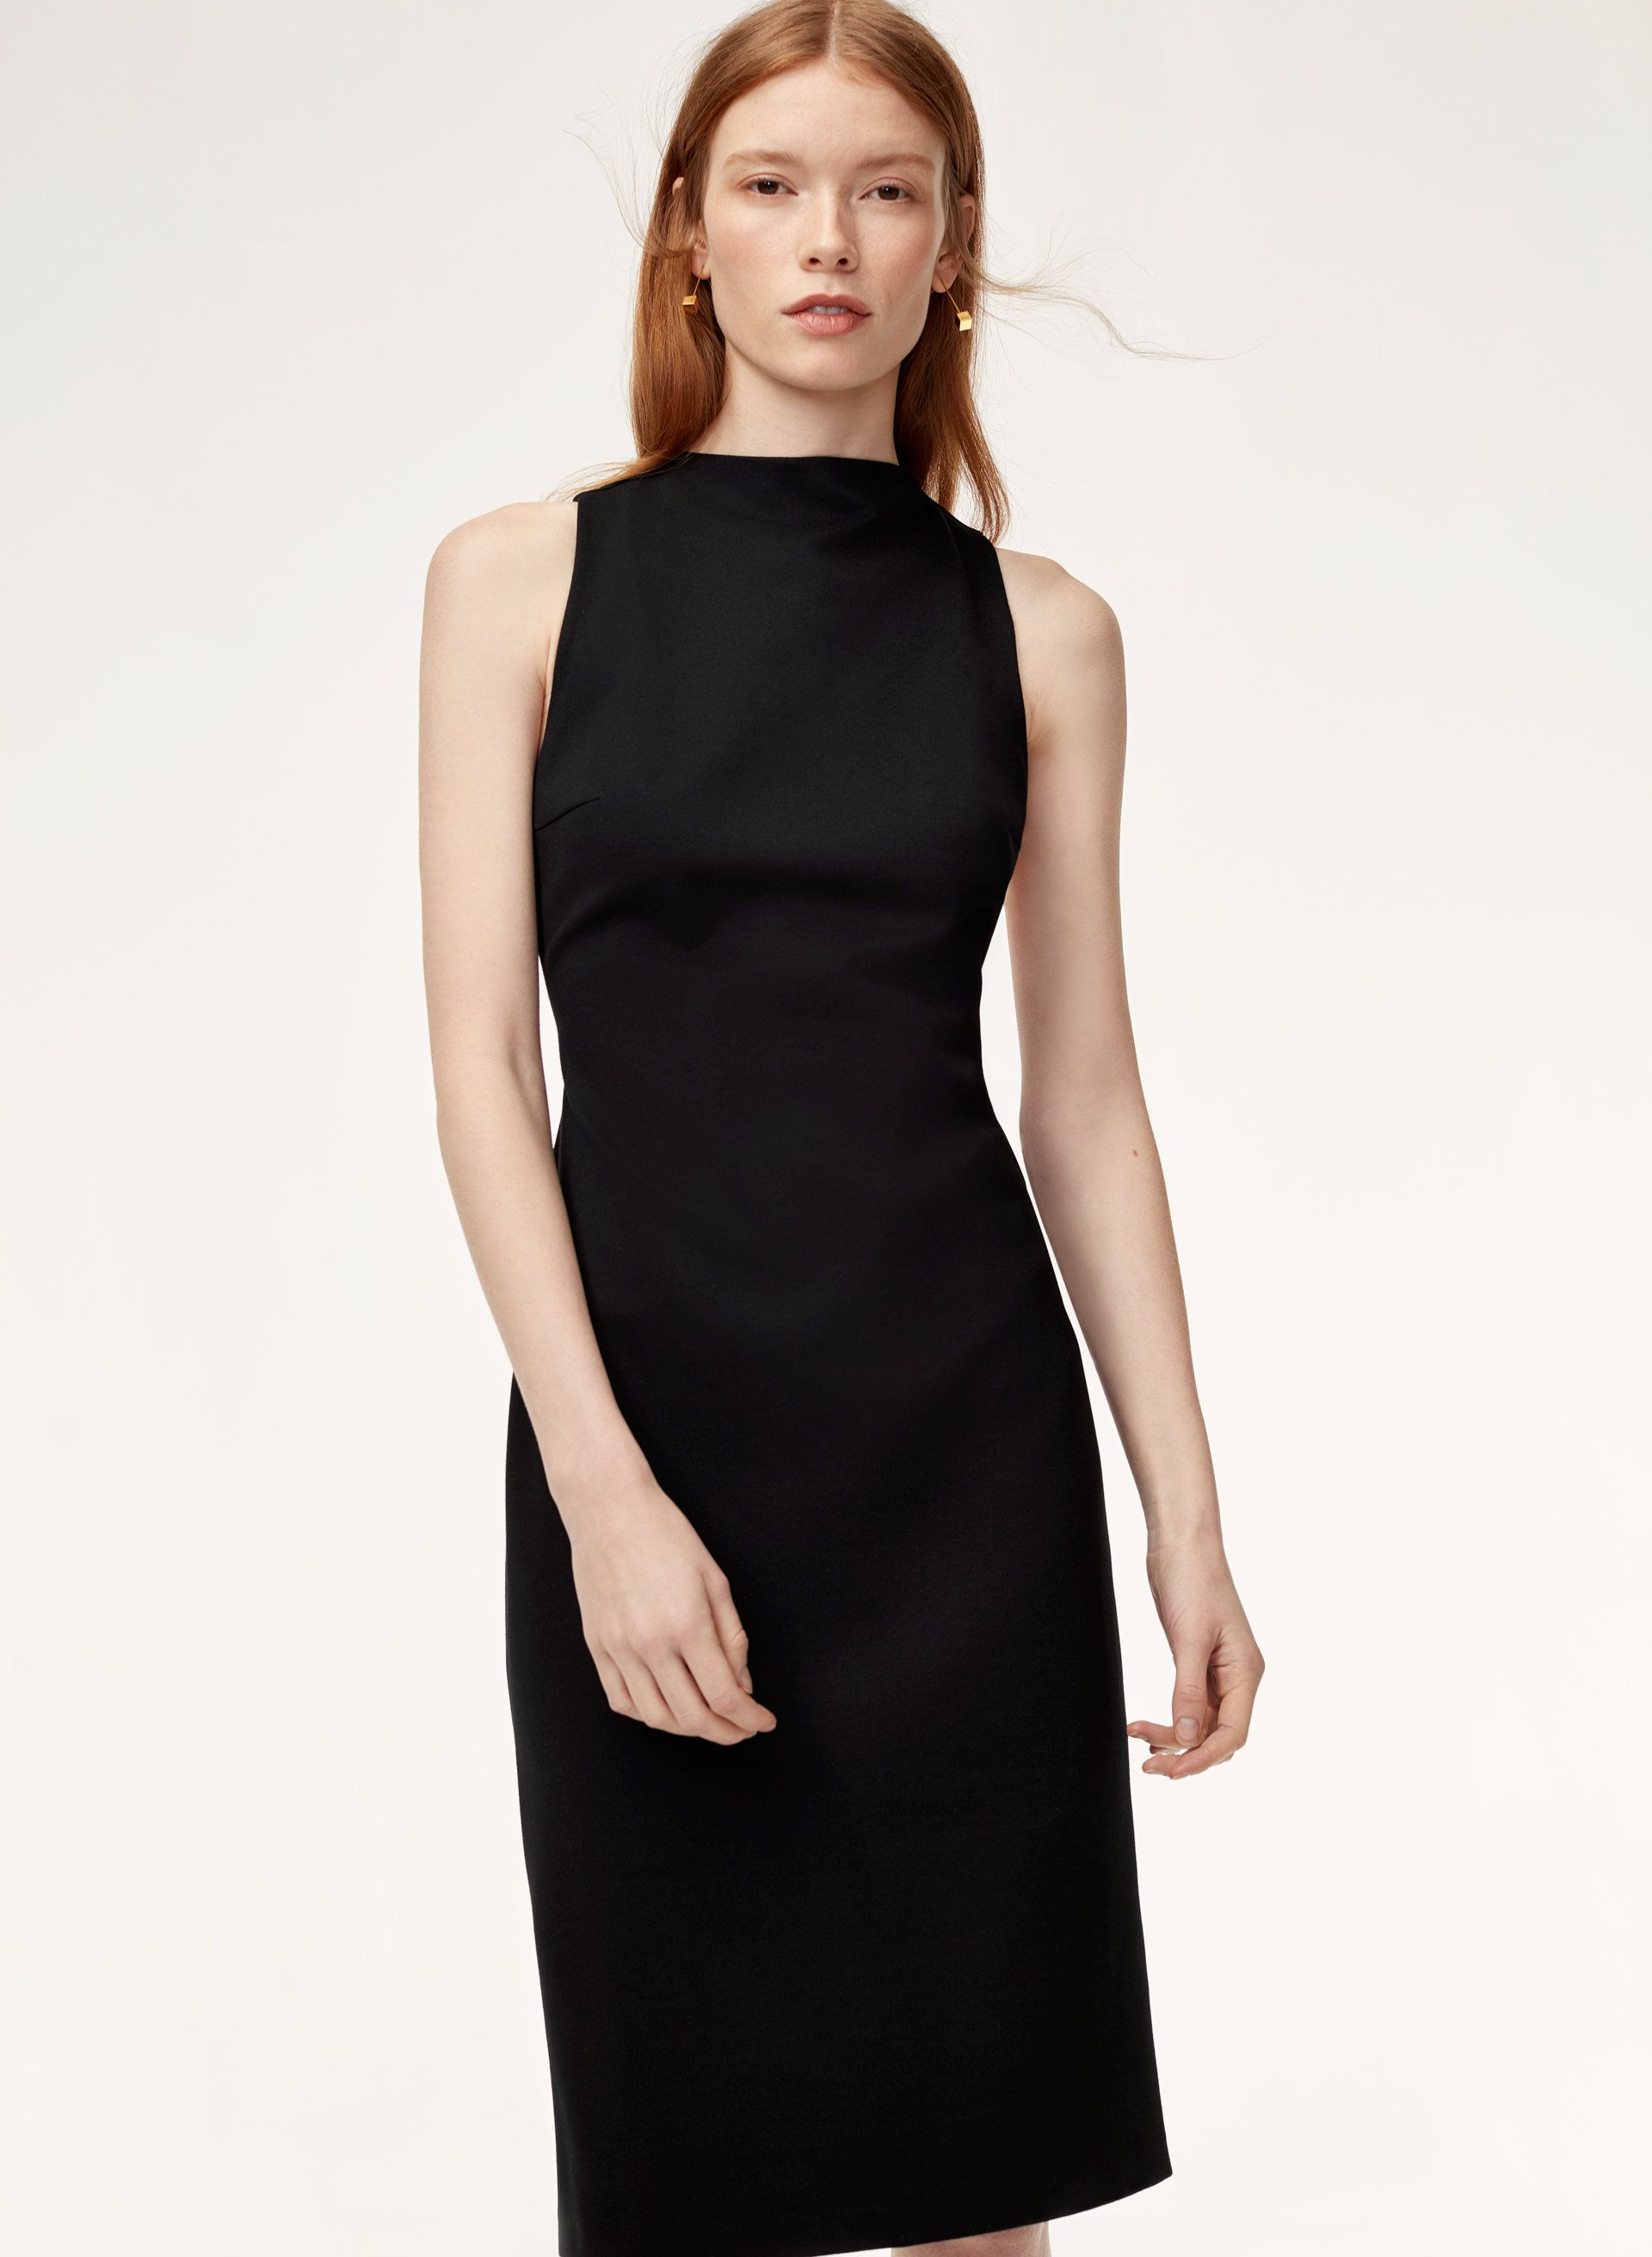 cbf0e945b0 Matheson dress